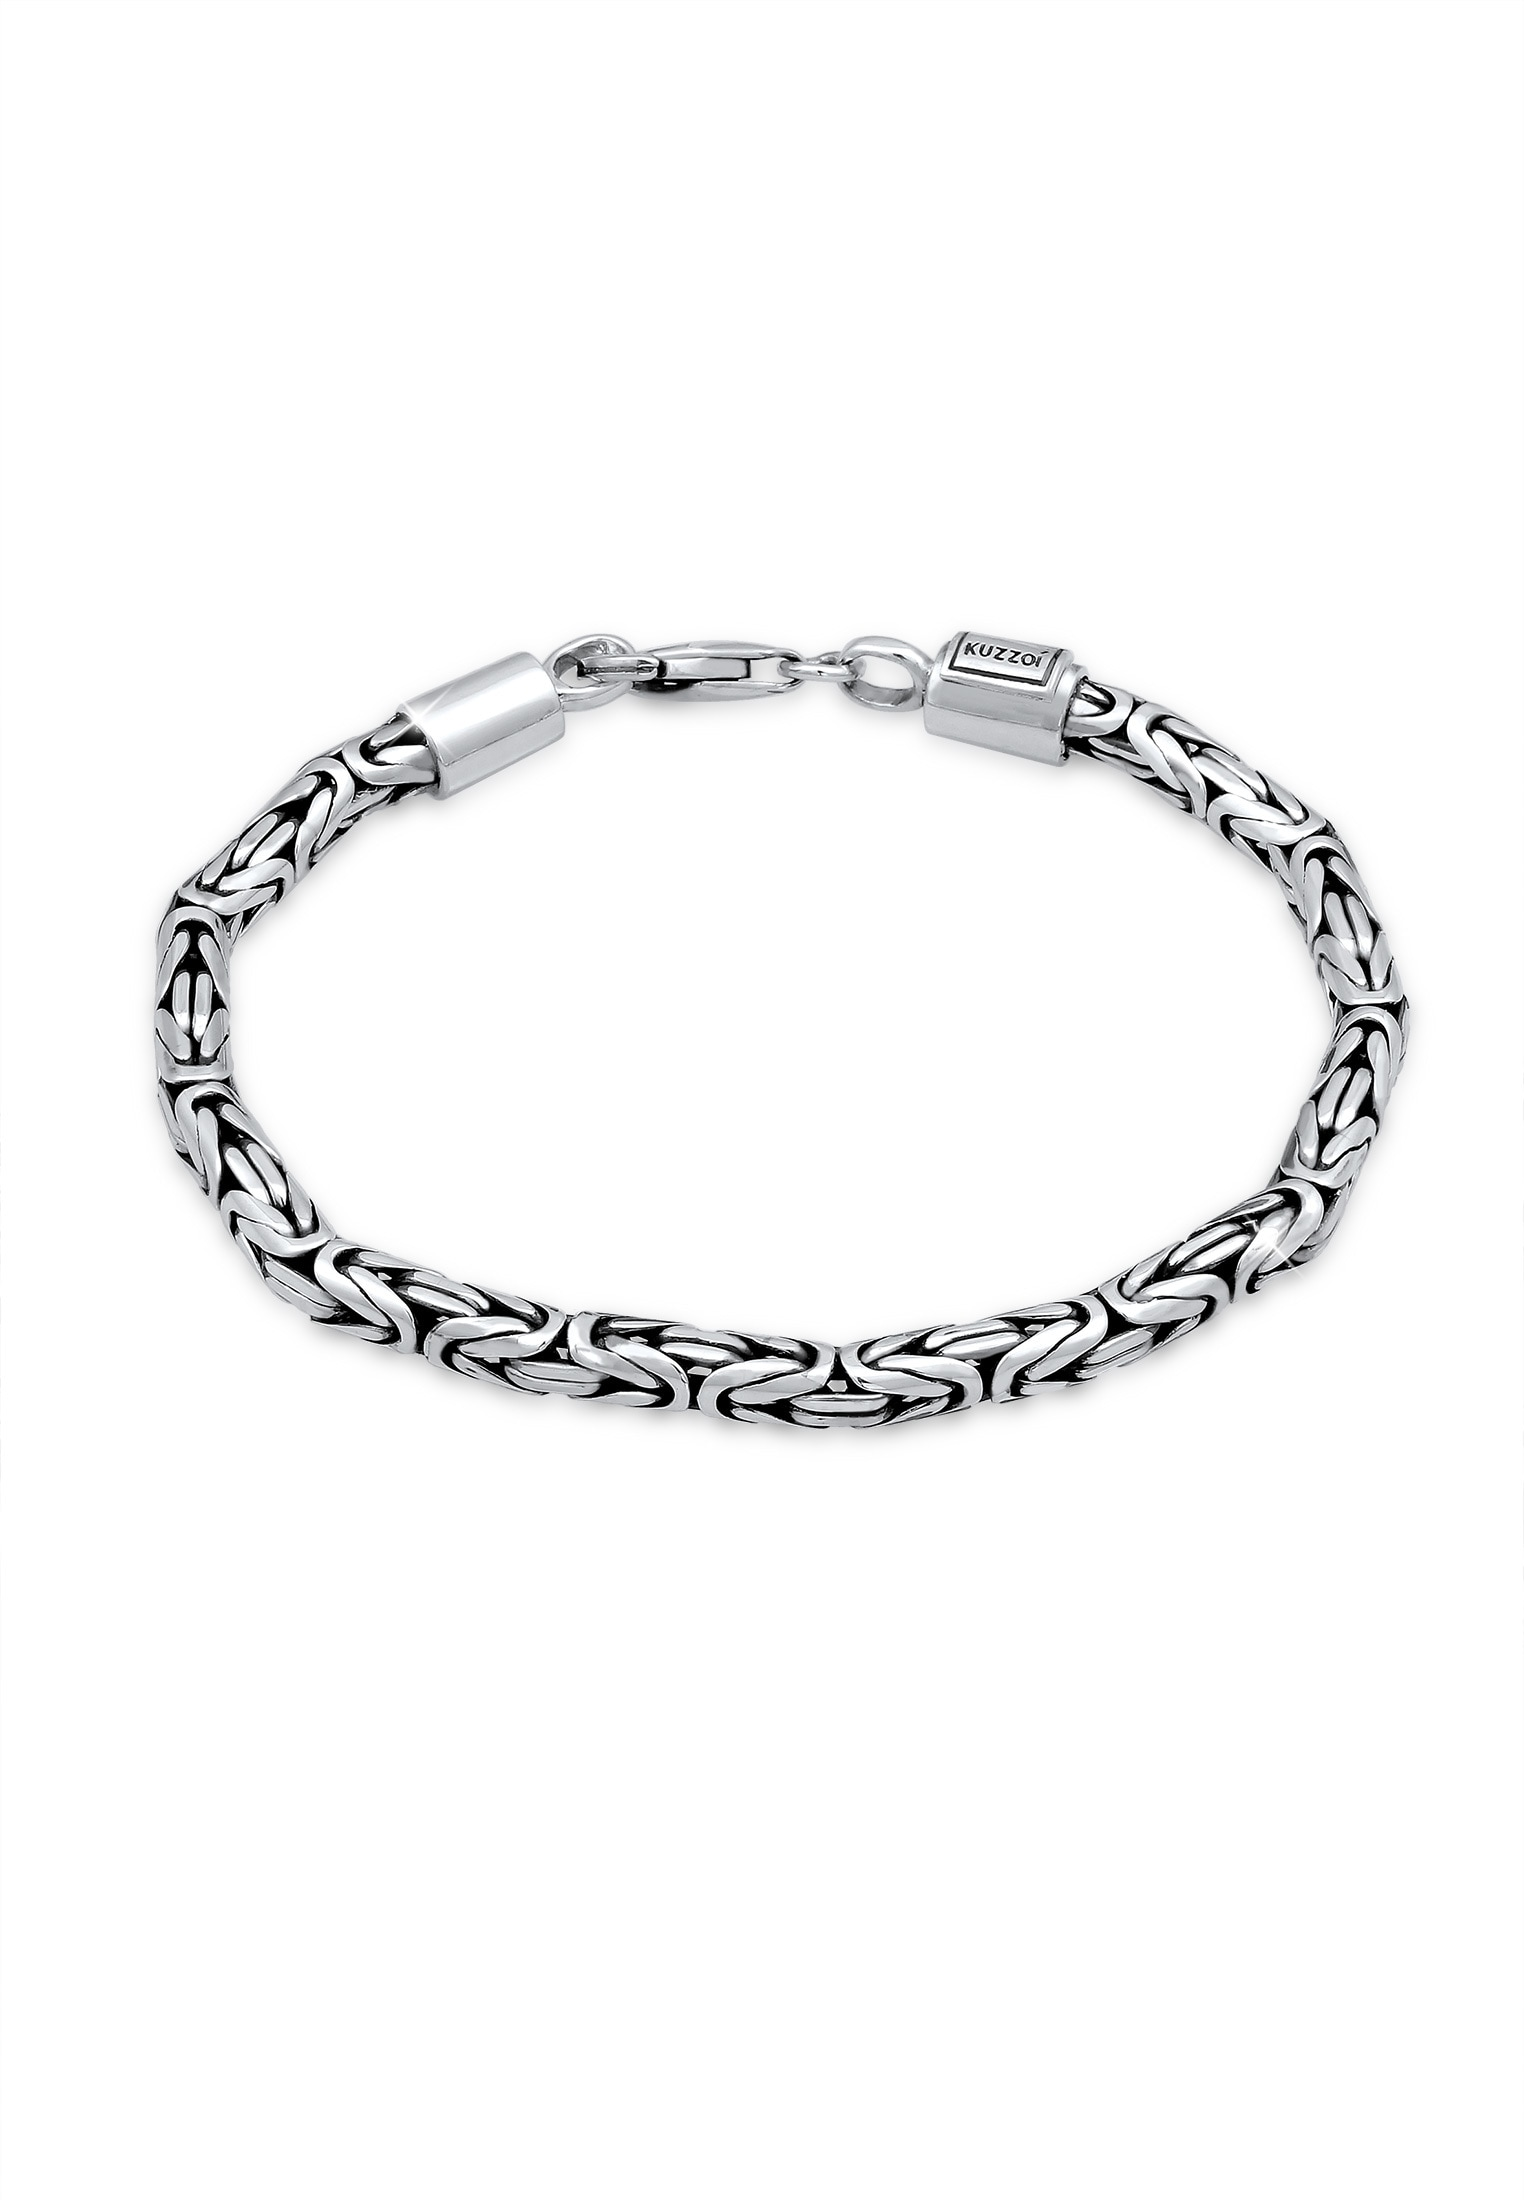 Kuzzoi Armband Herren Königskette Oxidiert 925 Silber | Schmuck > Armbänder > Silberarmbänder | Kuzzoi